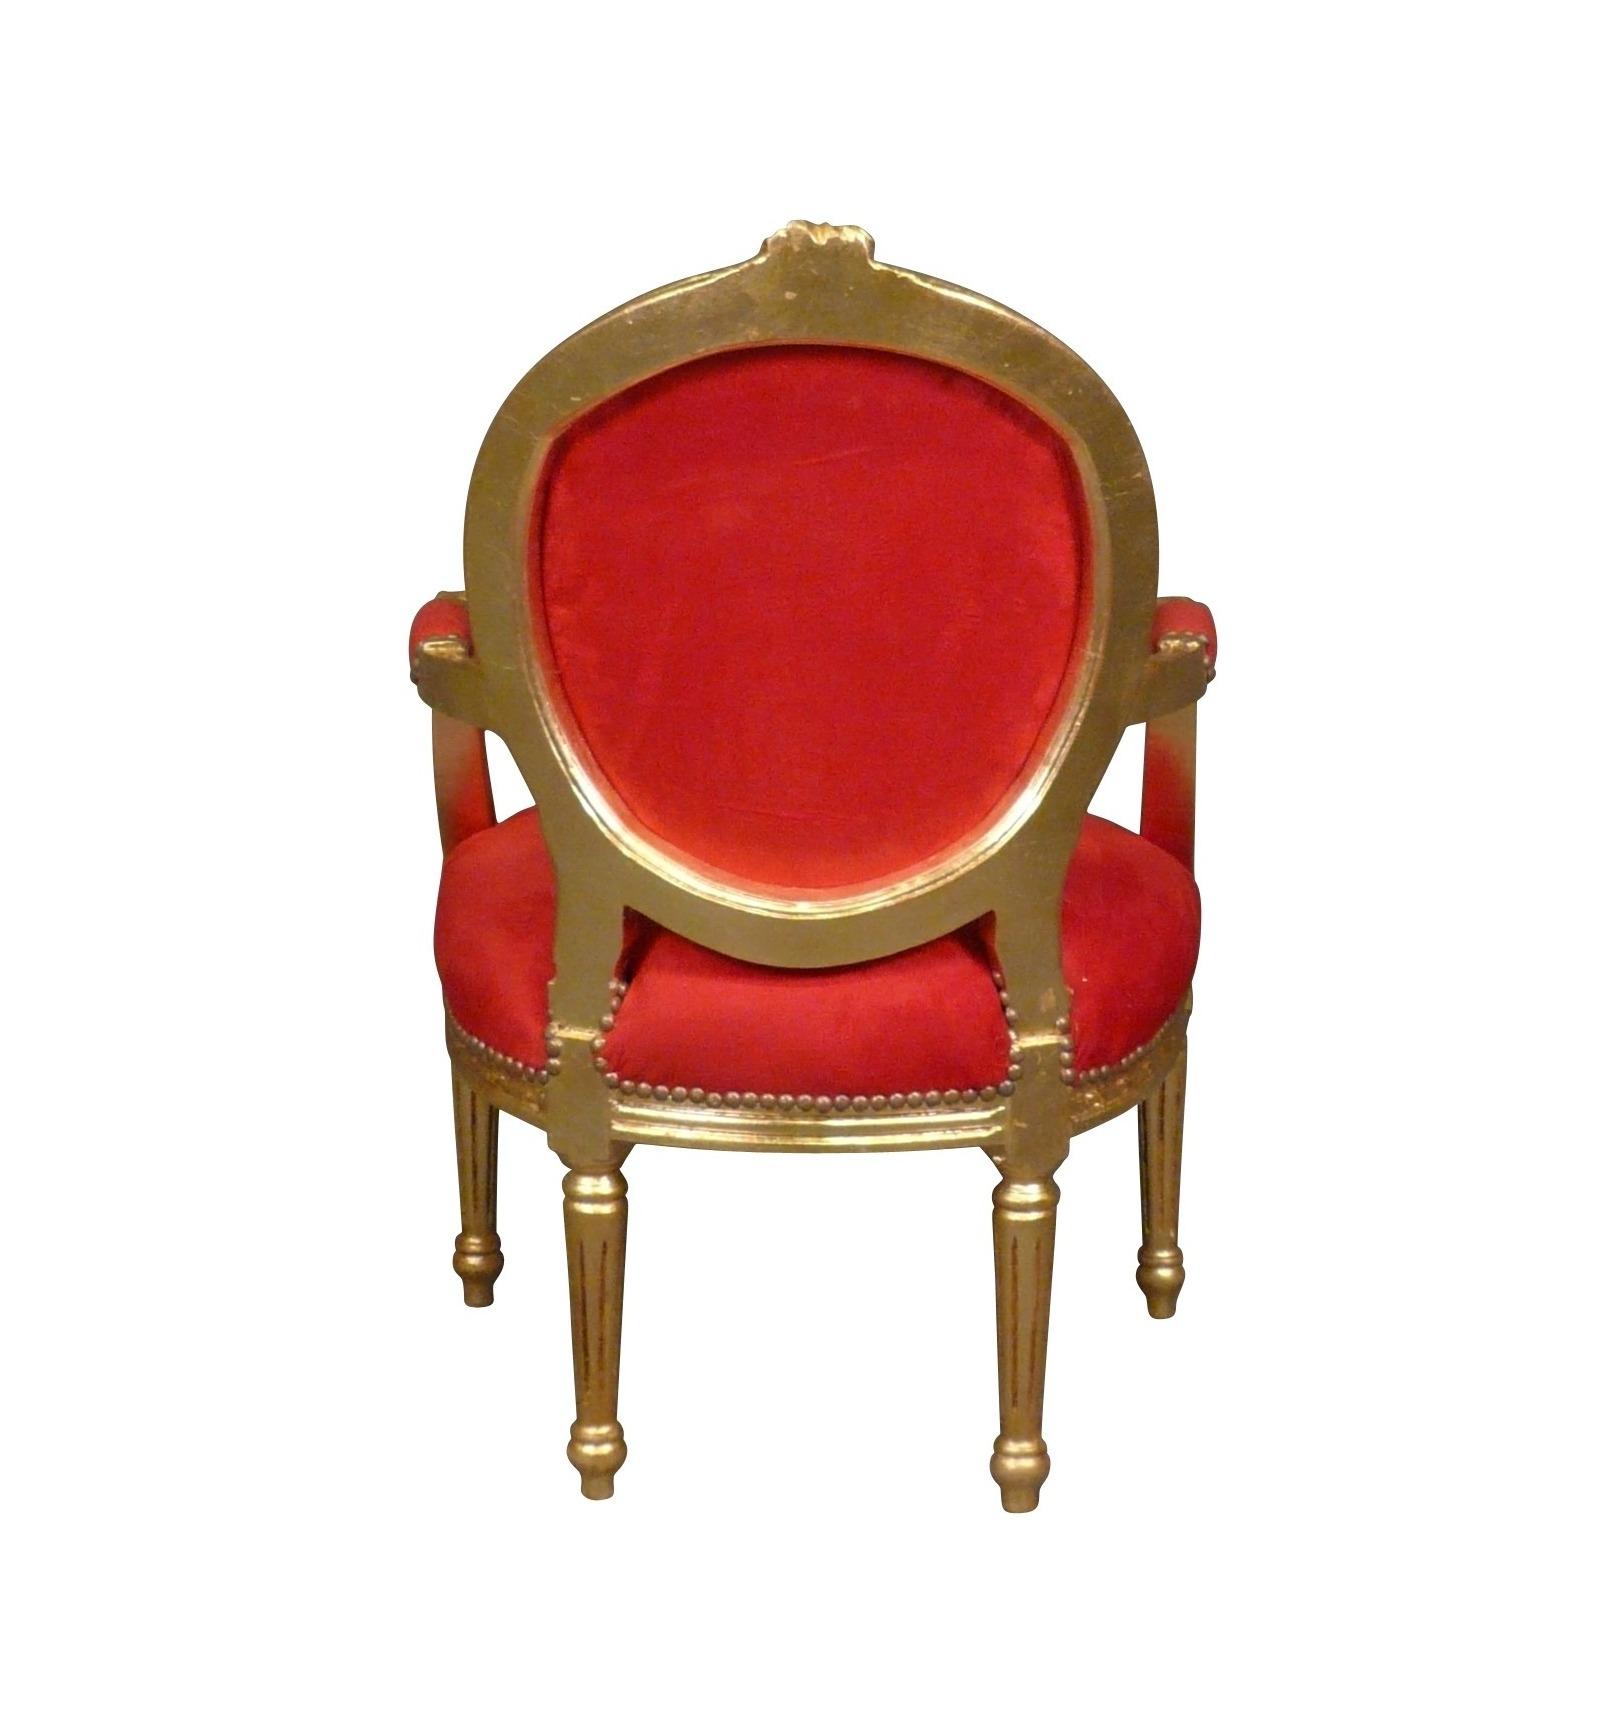 fauteuil louis xvi m daillon chaise baroque. Black Bedroom Furniture Sets. Home Design Ideas